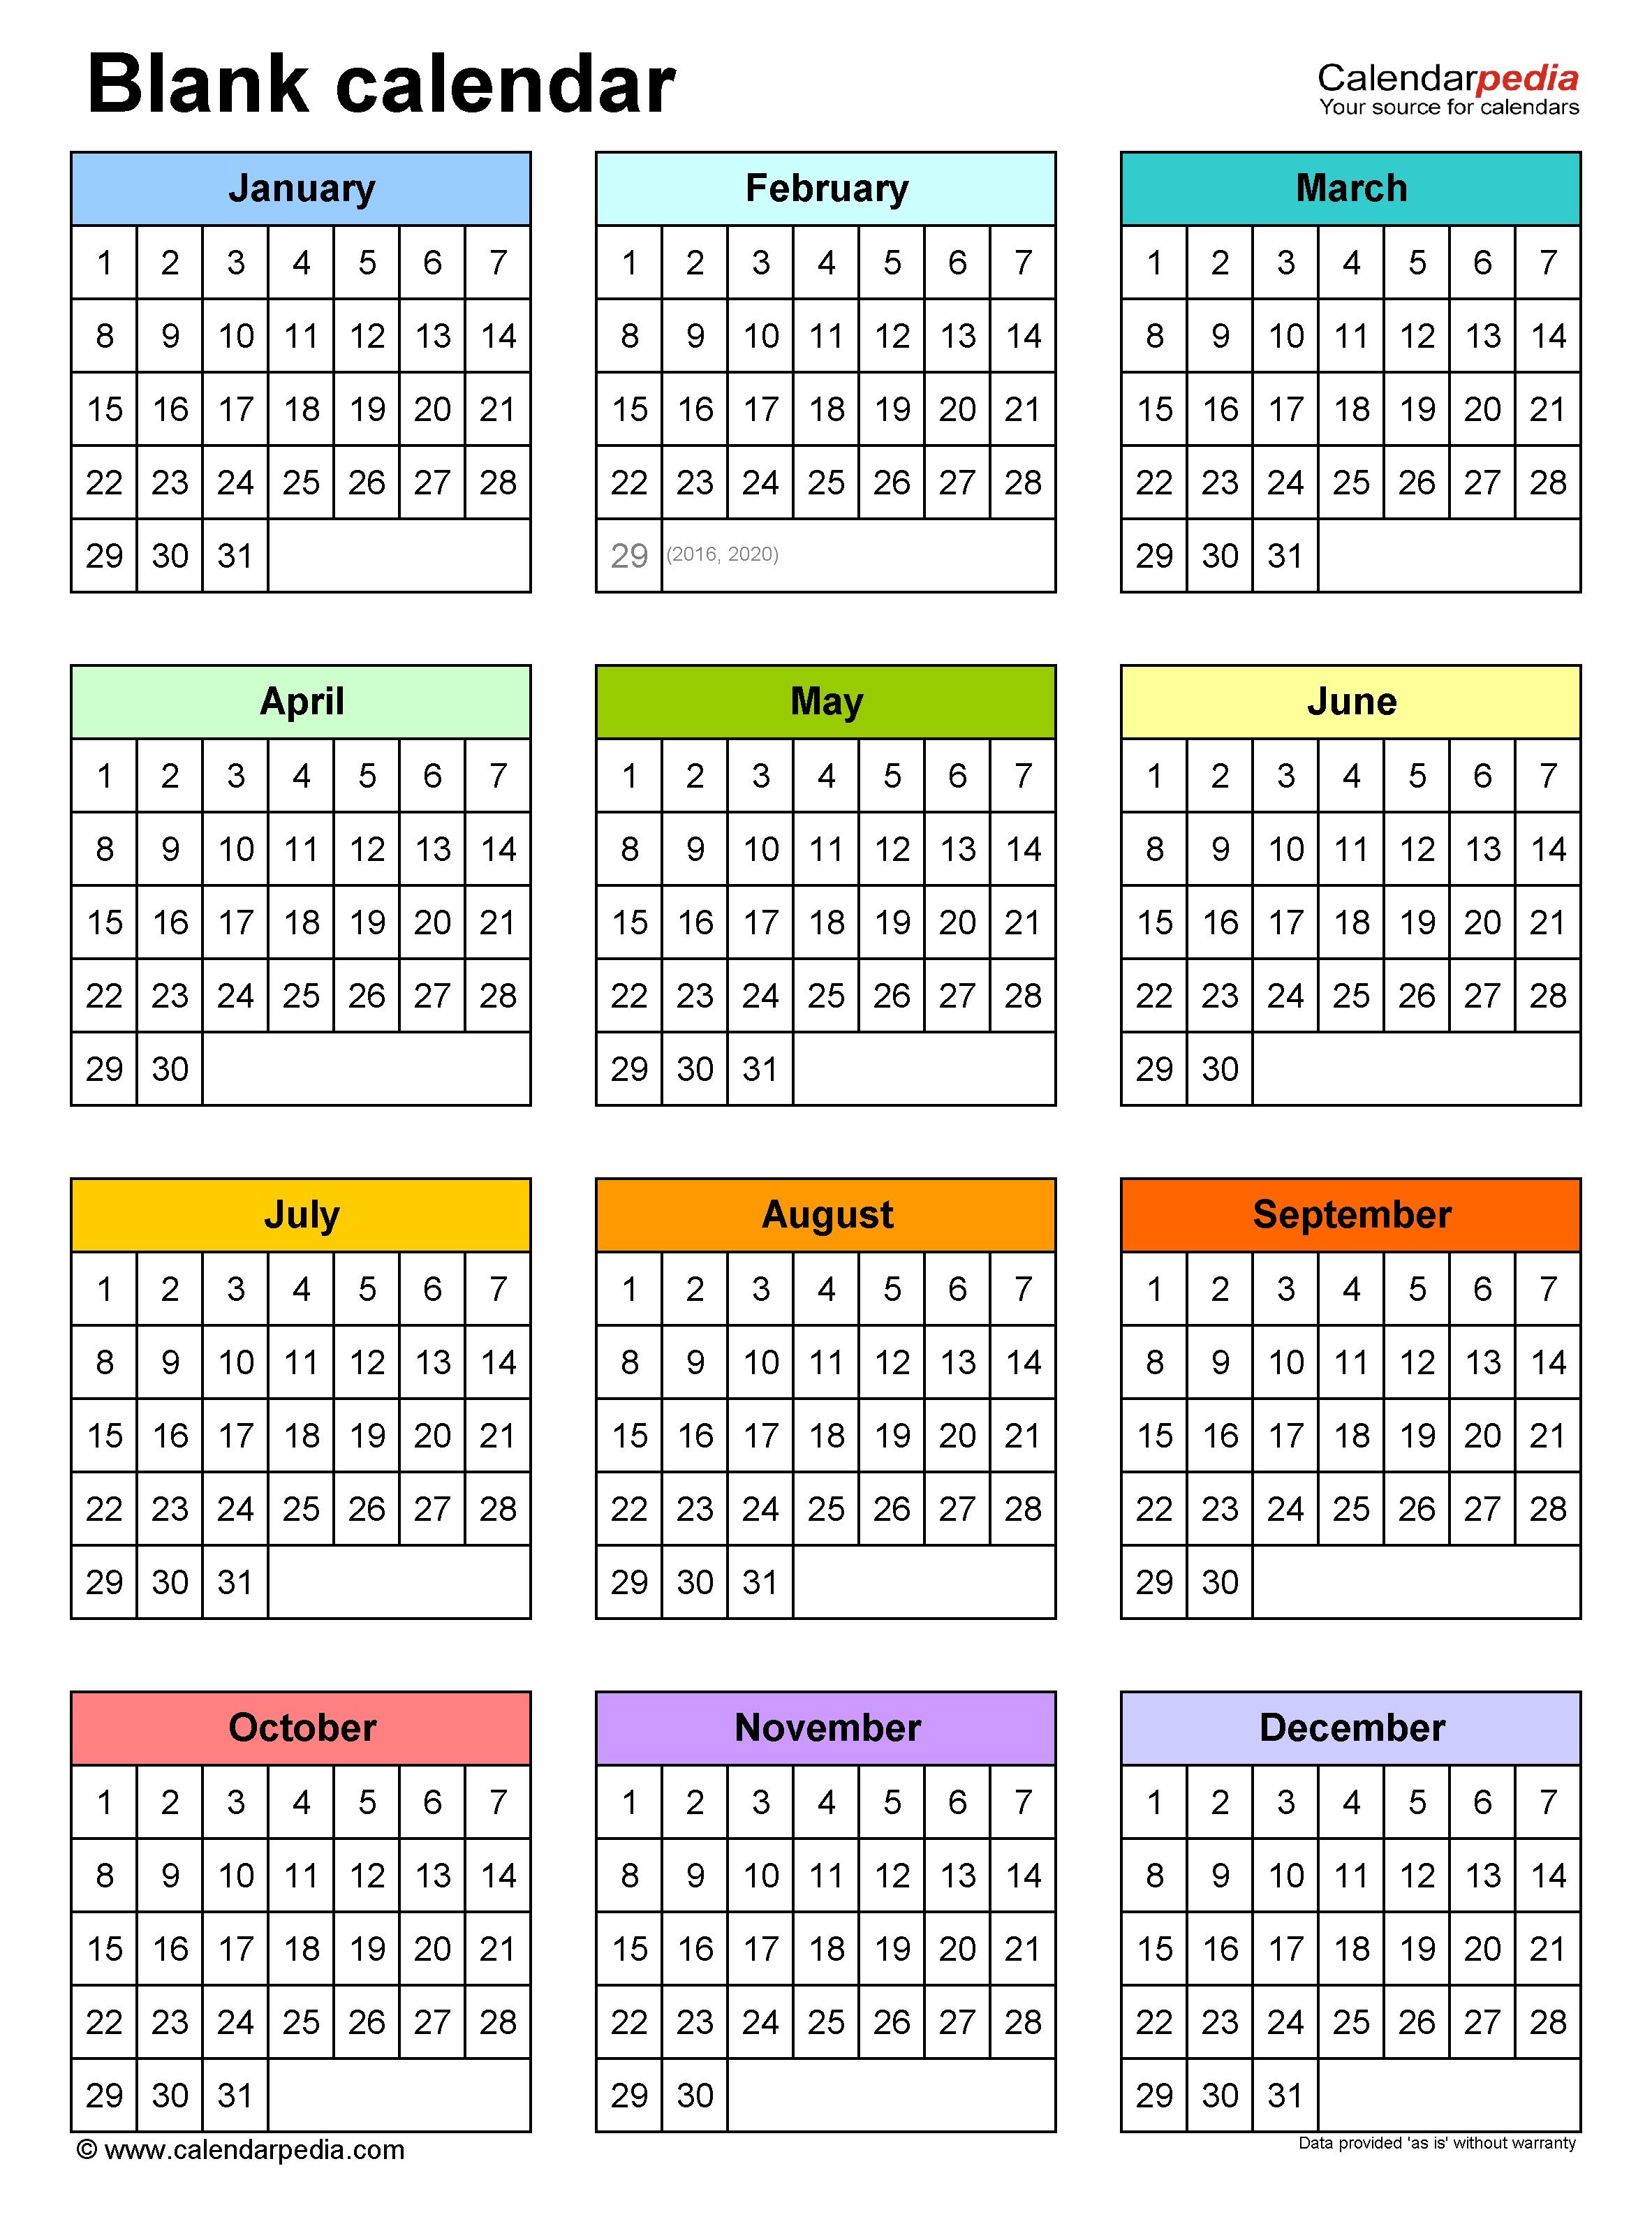 Blank Calendars - Free Printable Microsoft Word Templates 1 Page Calendar Template